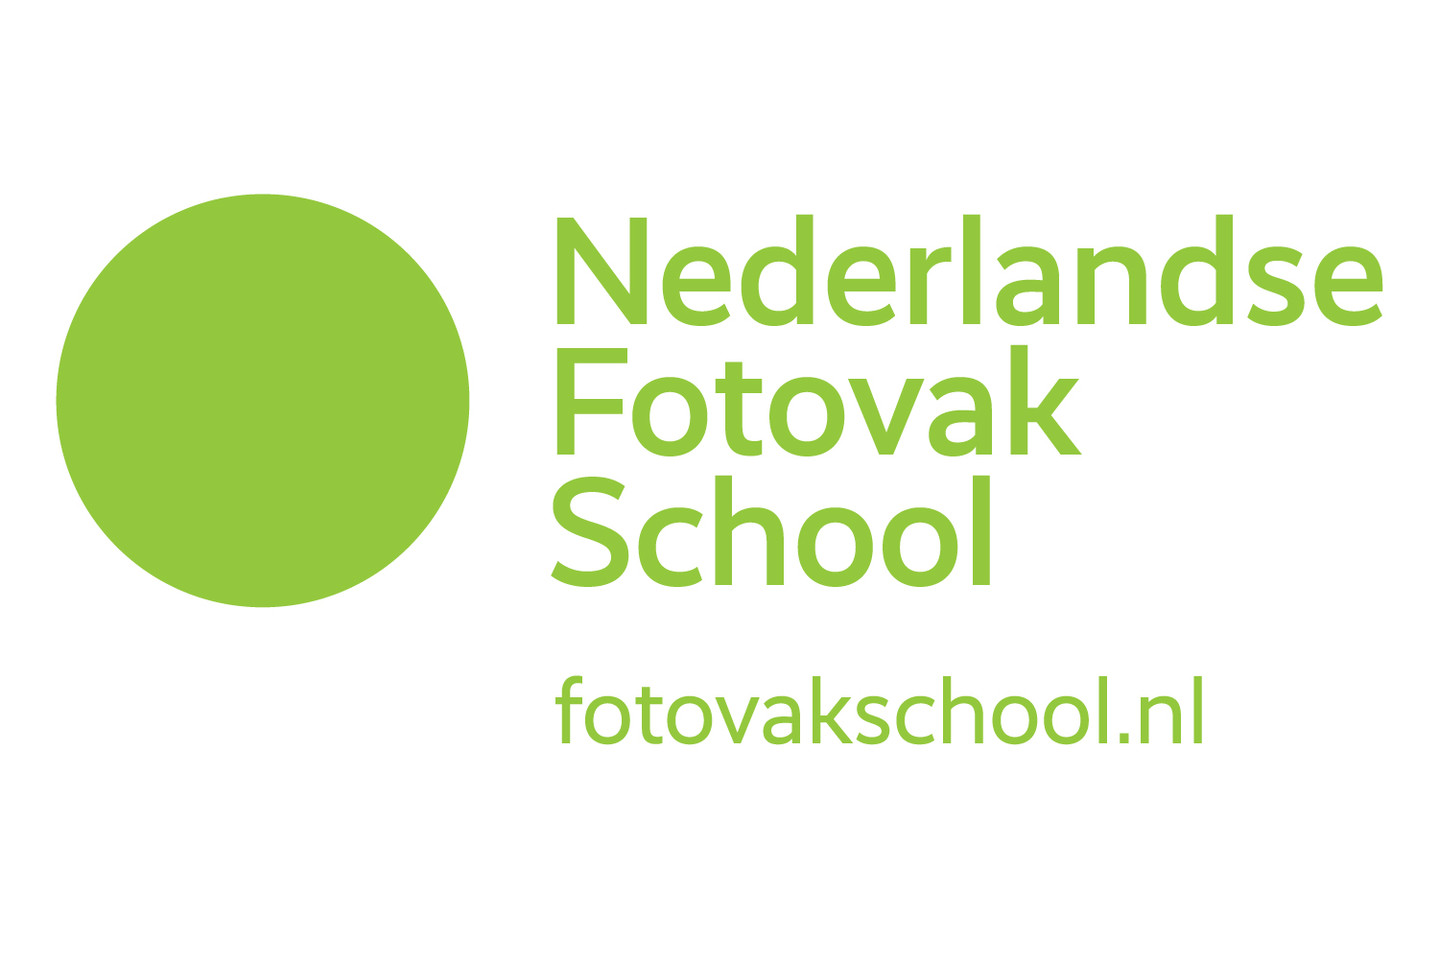 Nederlandse Fotovak School